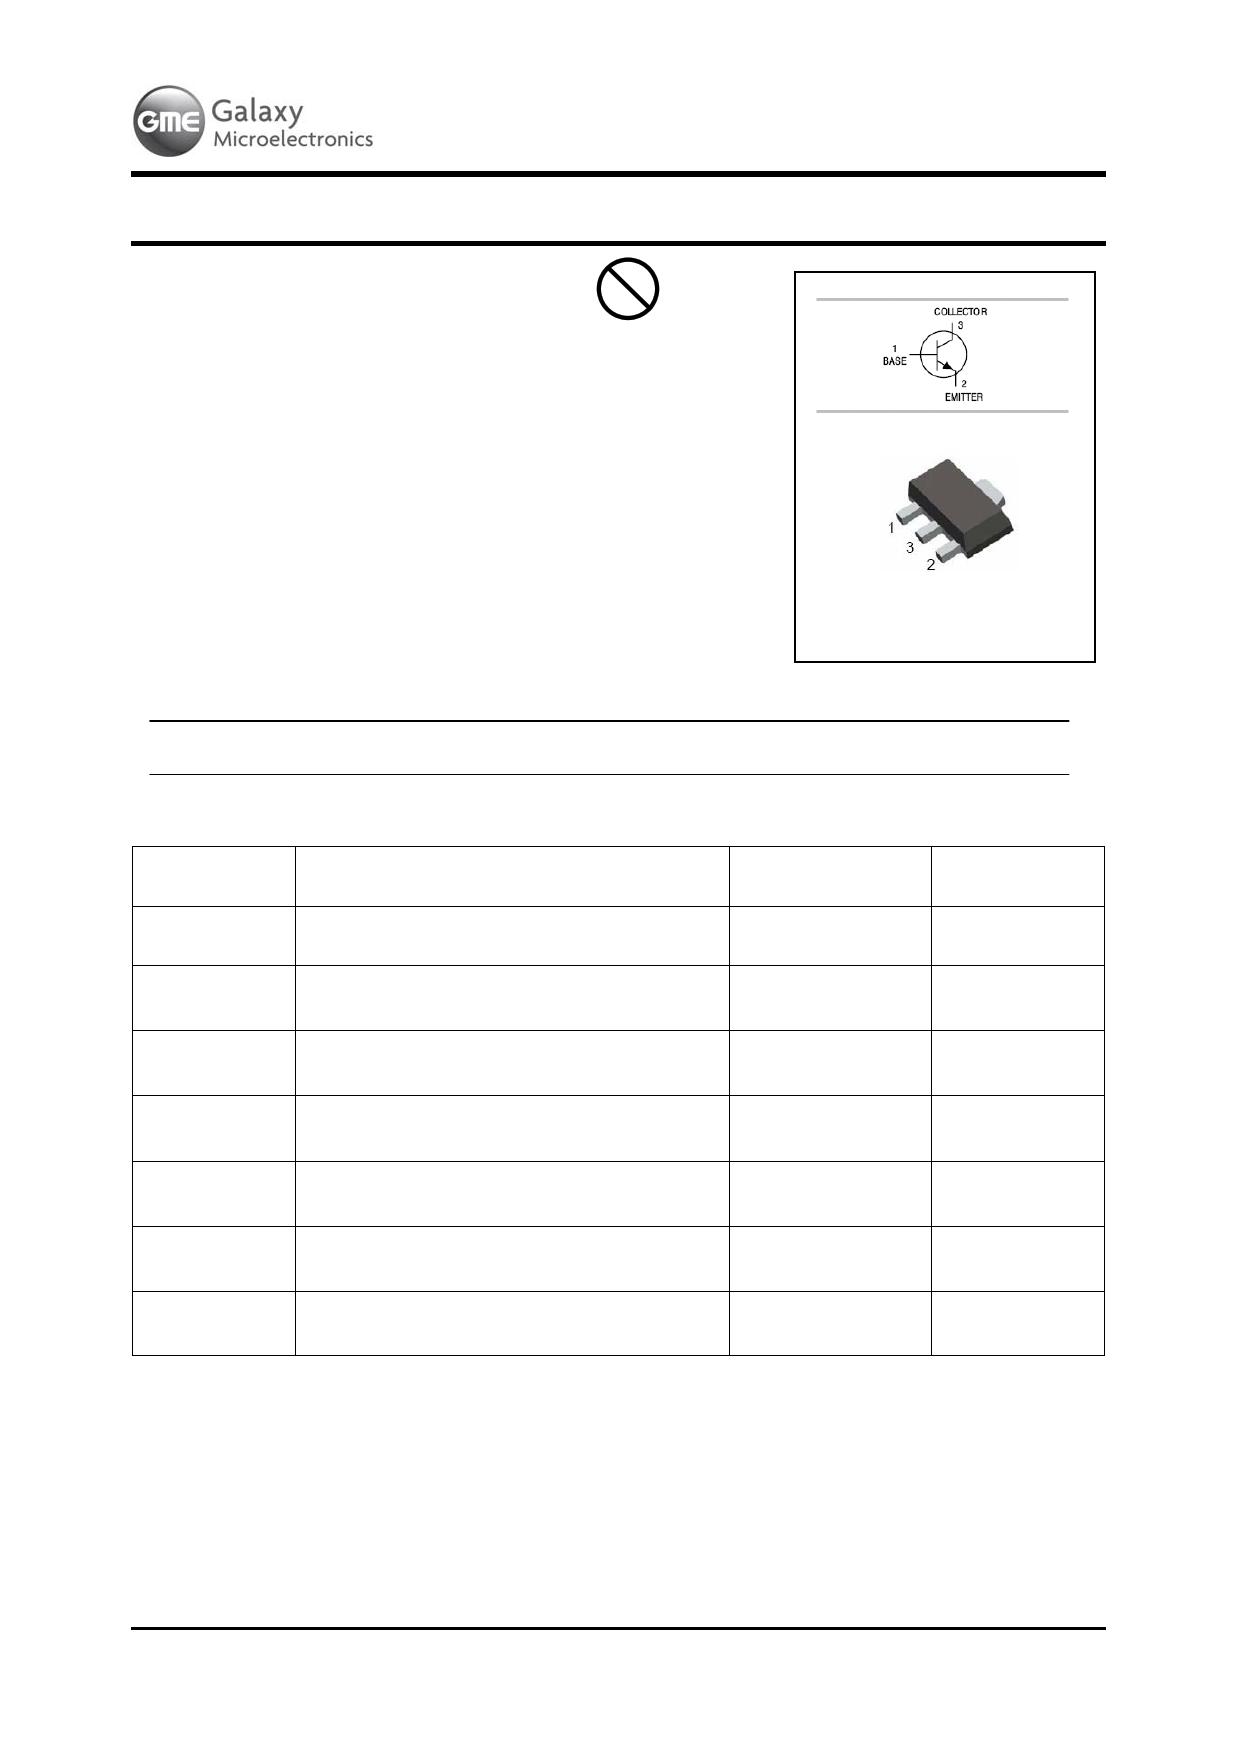 2SC4548 데이터시트 및 2SC4548 PDF